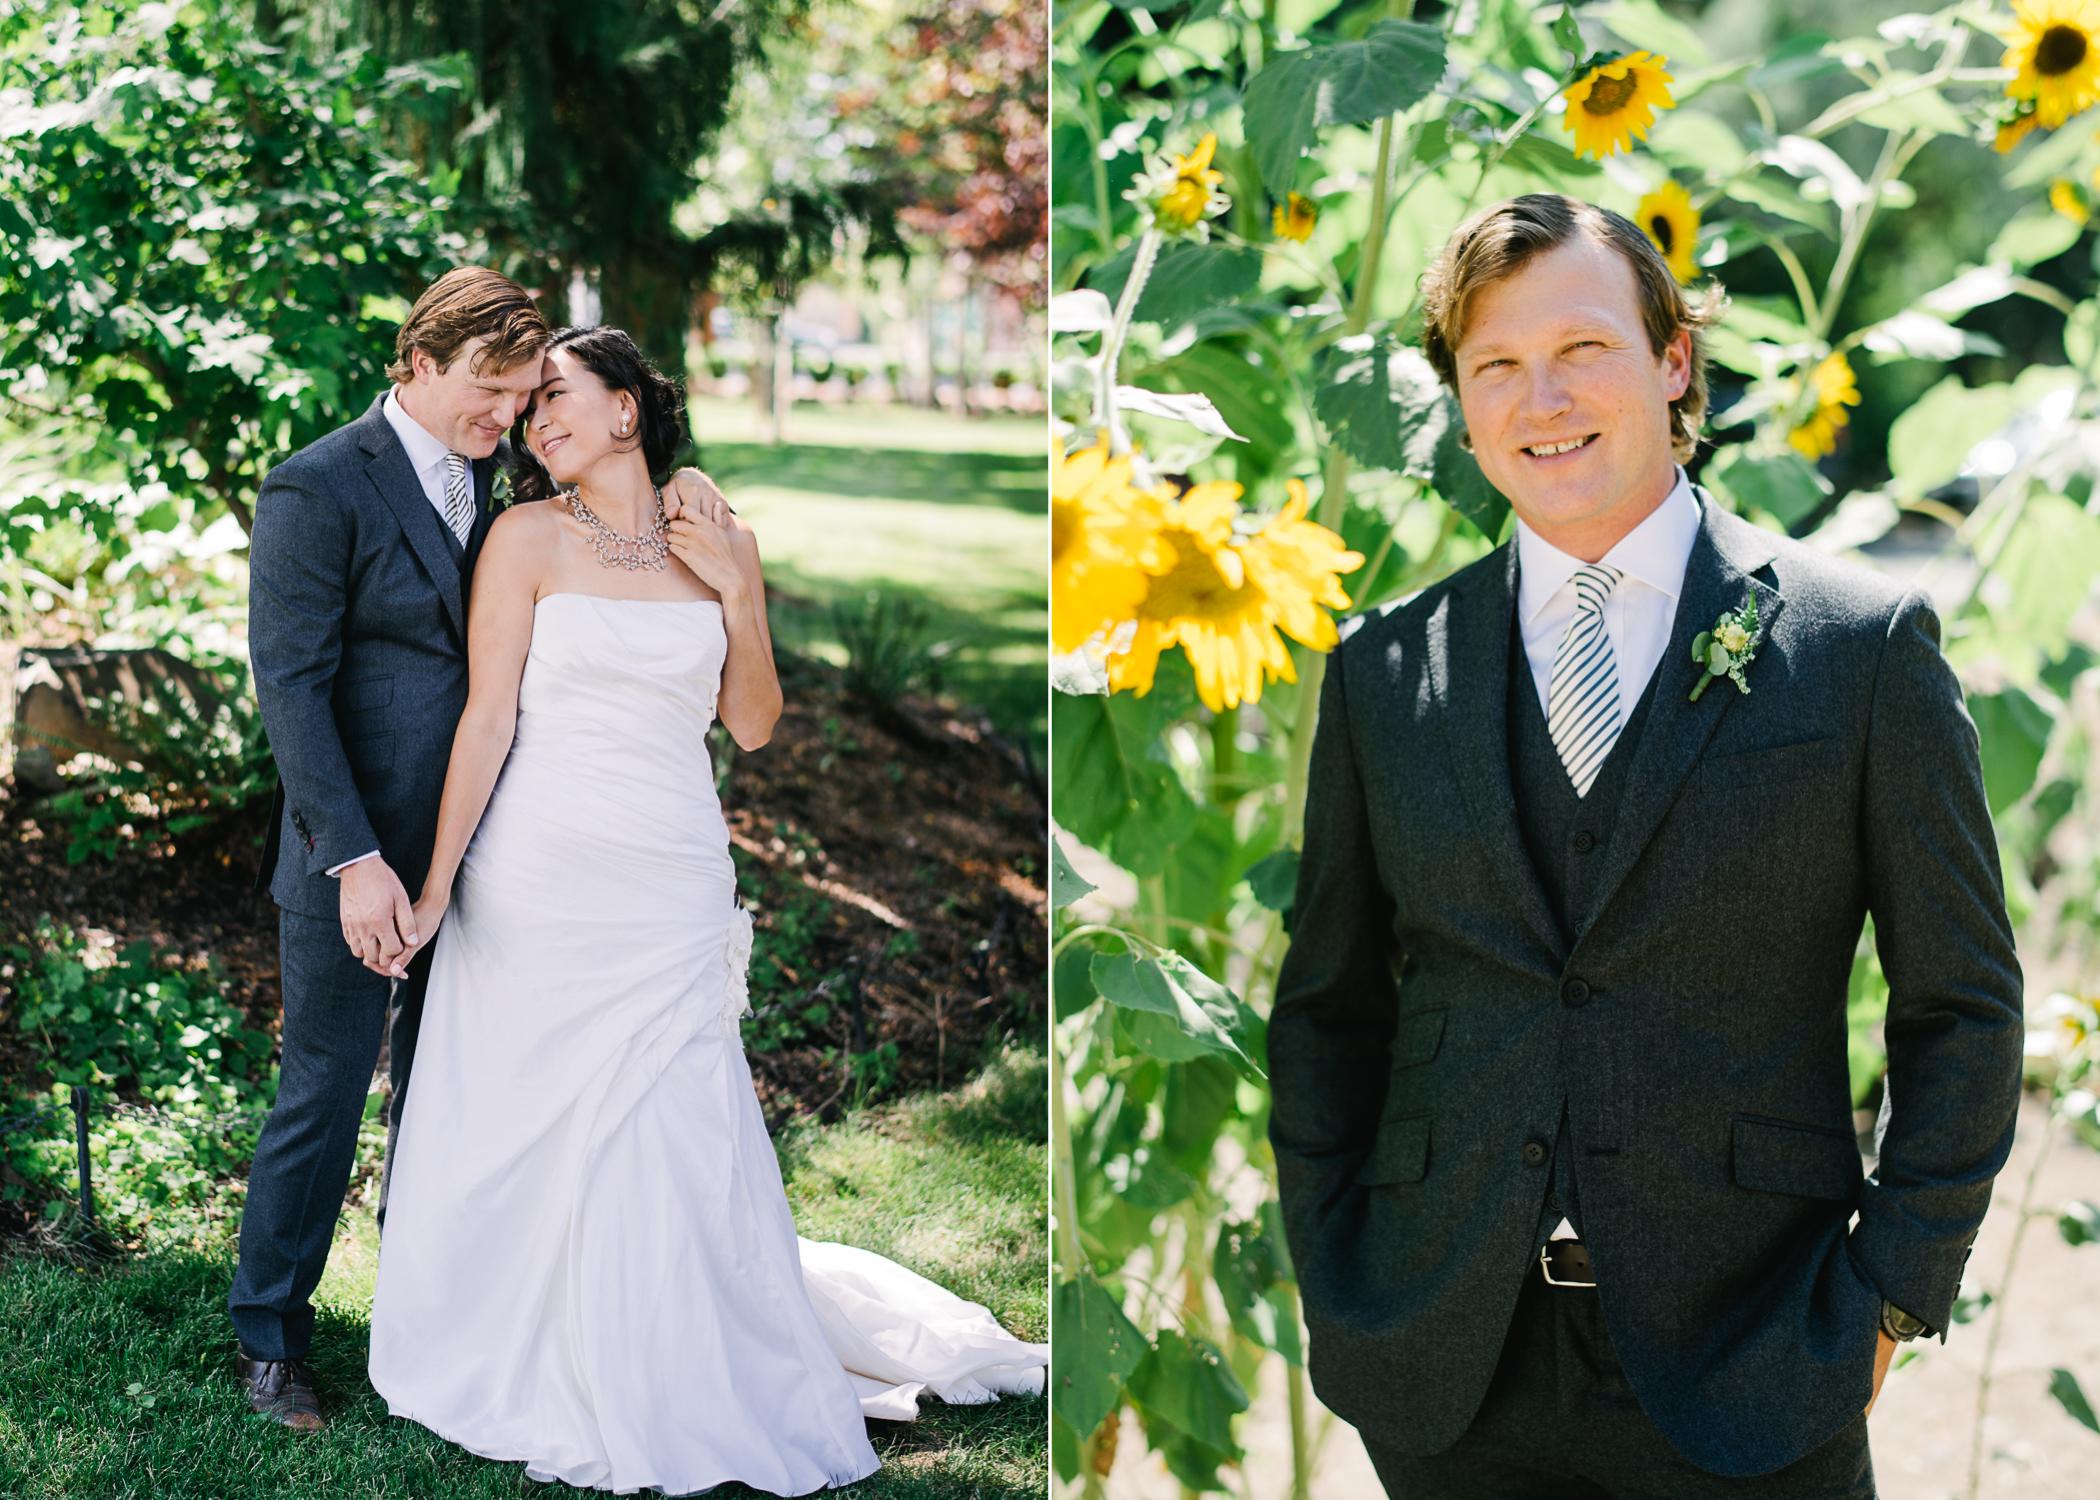 019-portland-wedding-photography-best-2018.jpg